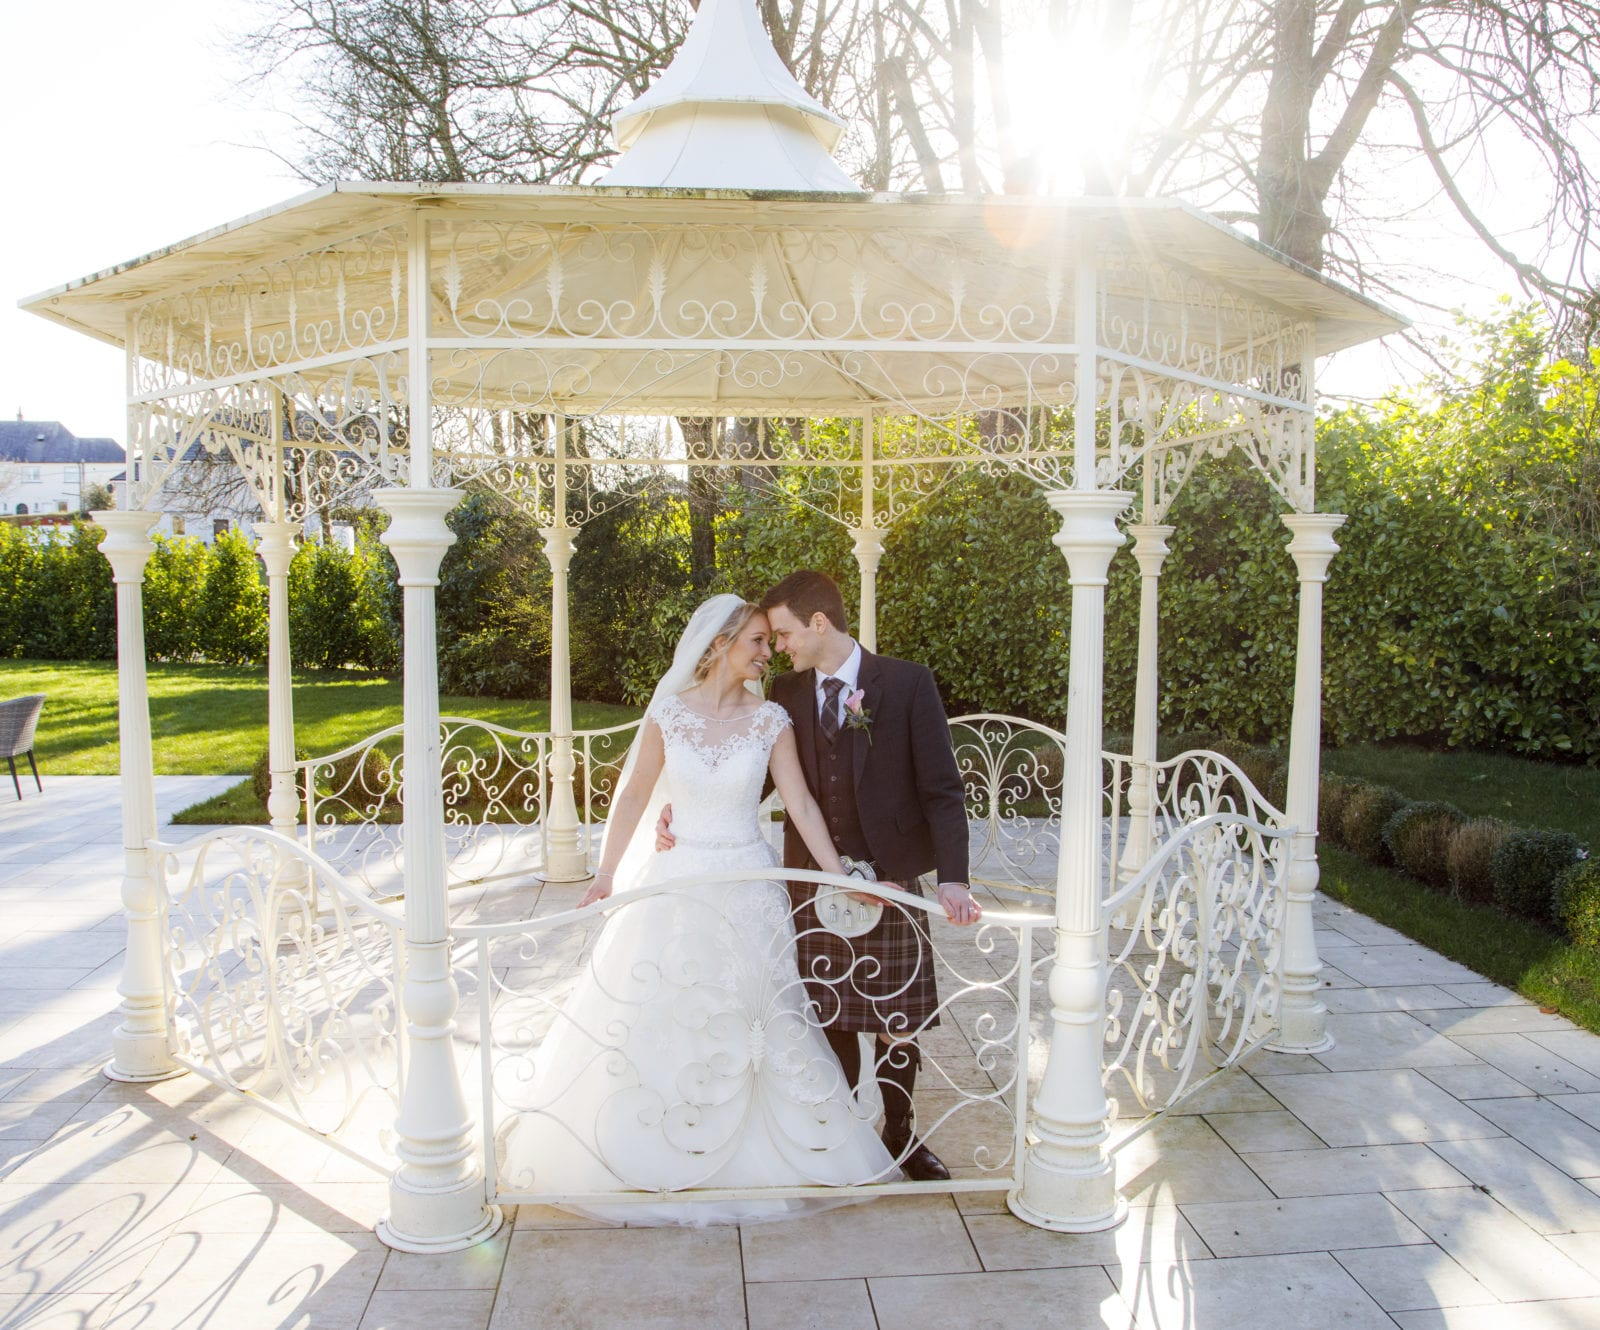 Dalmeny Park Hotel Wedding Venue